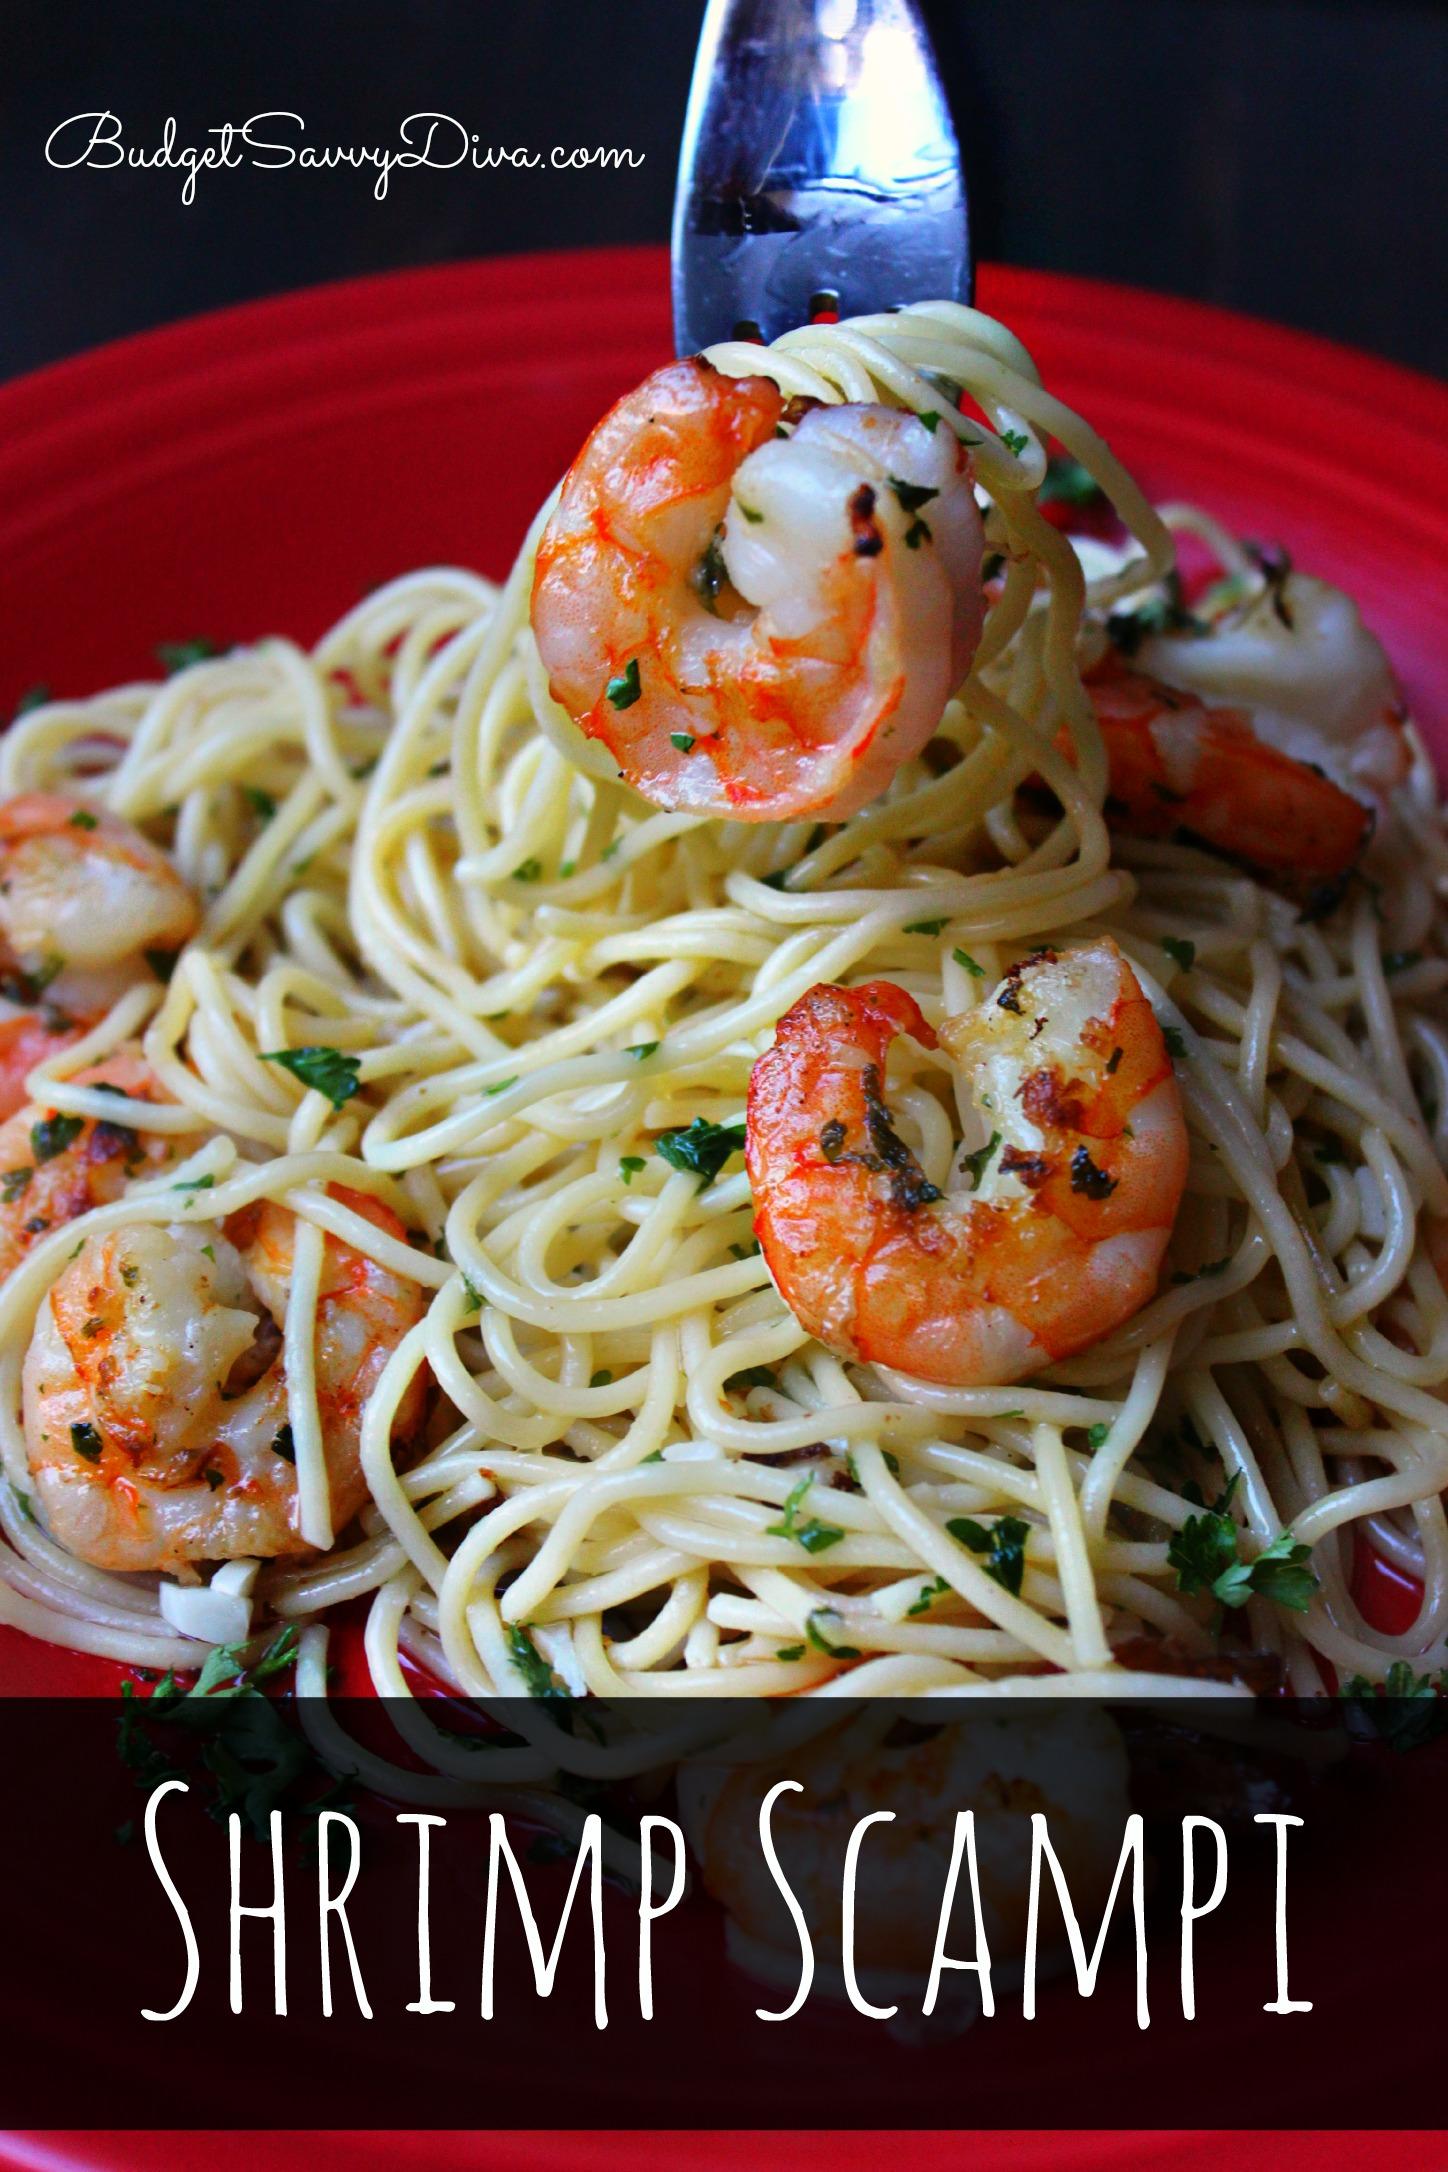 Seafood Crockpot Recipes Dinner